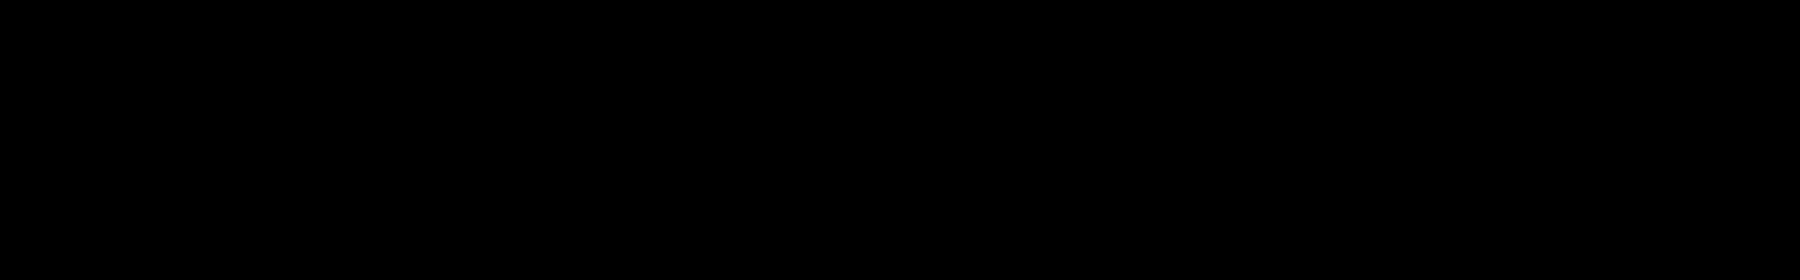 Drip Sauce audio waveform